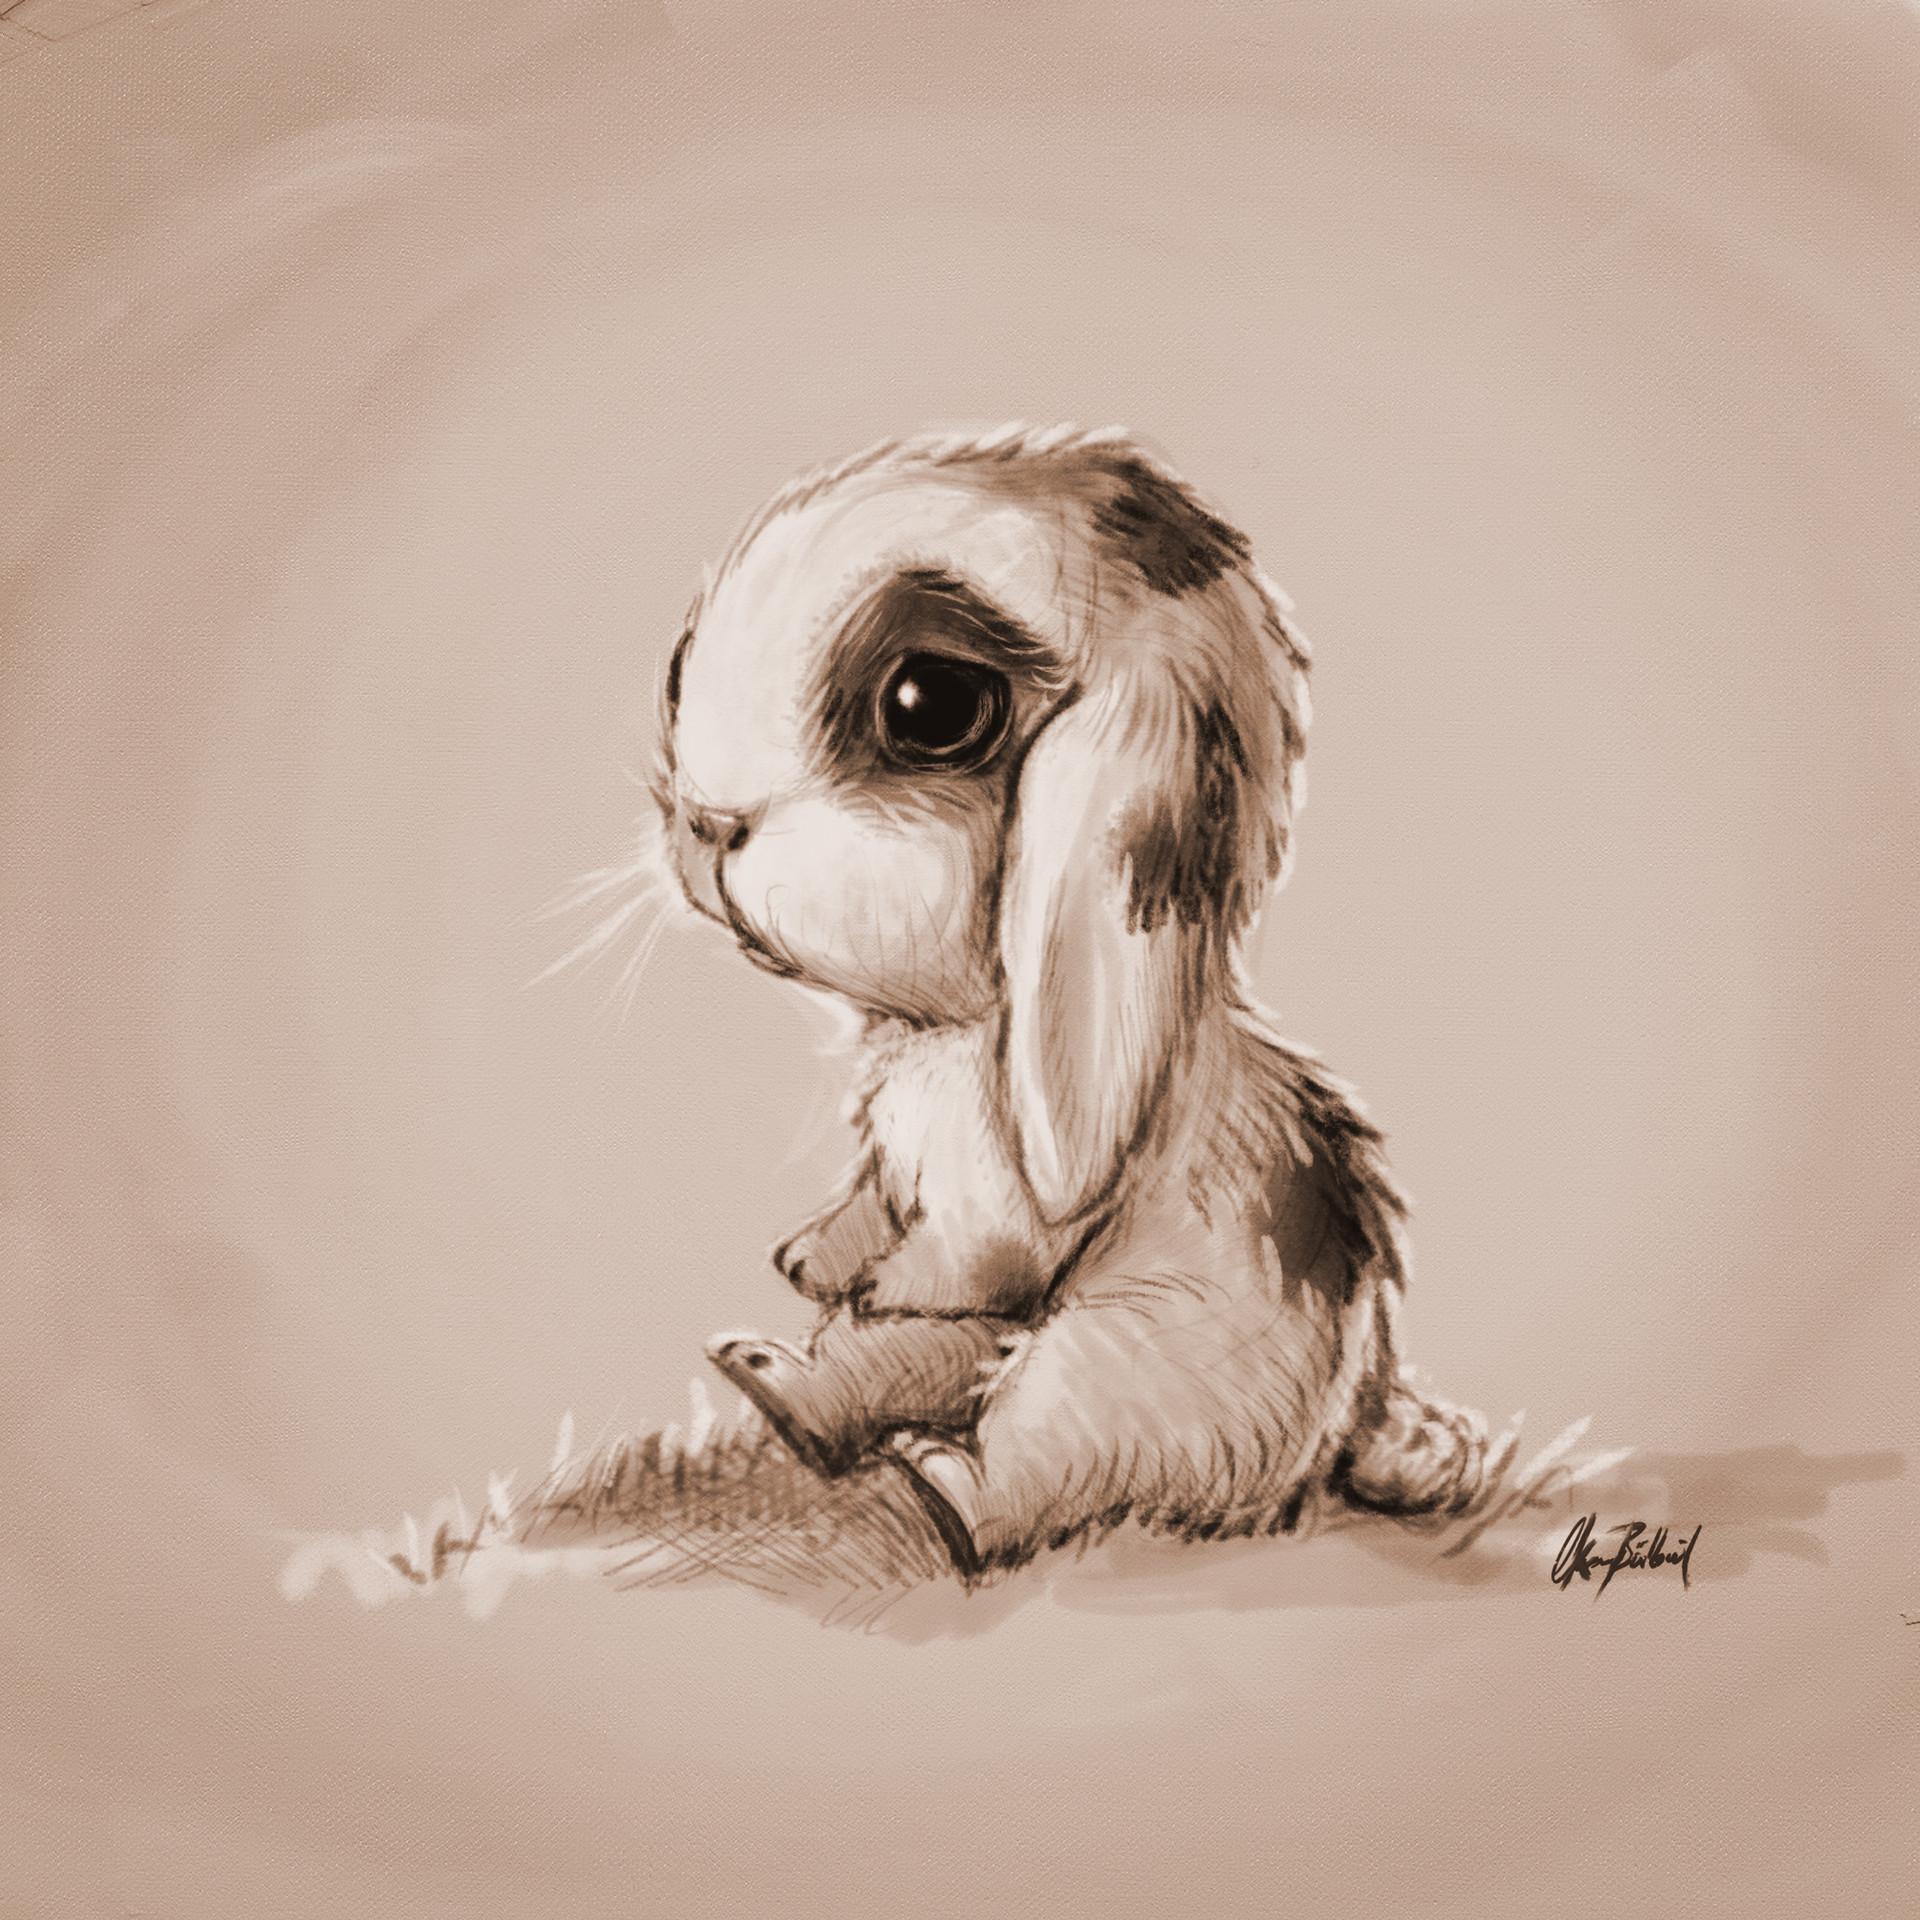 Lonely bunny photo